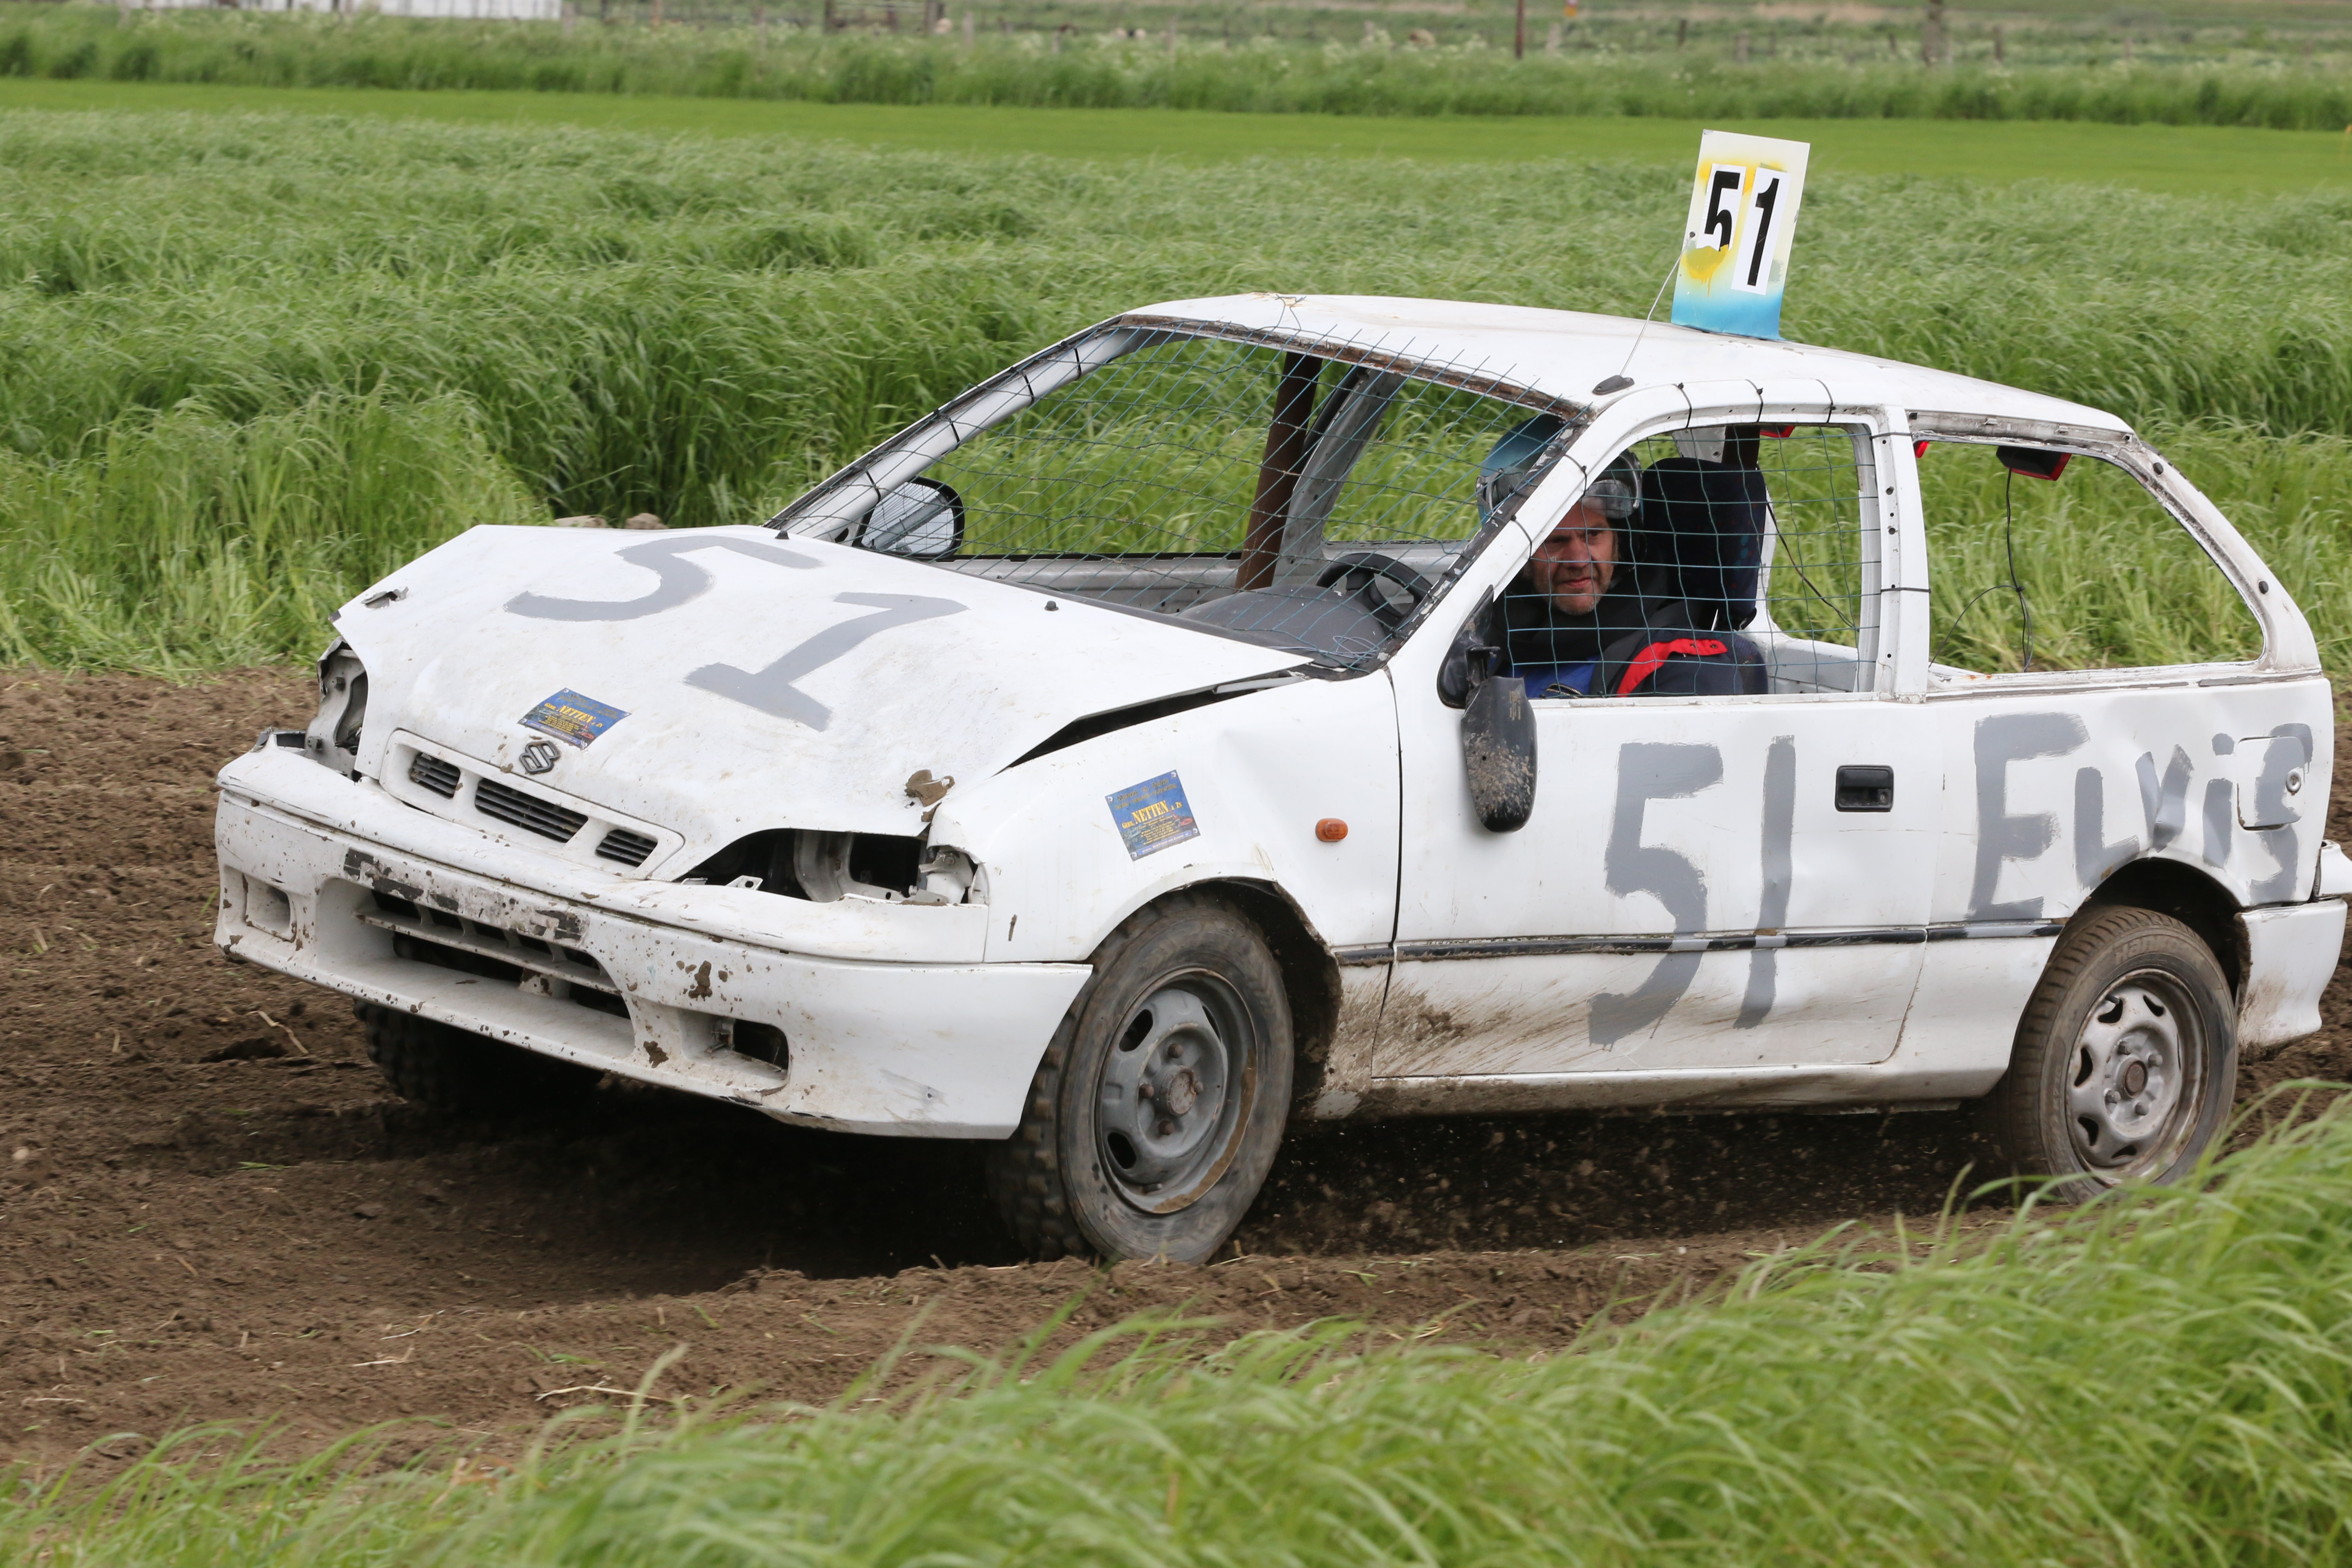 autocross sluiskil 14-5-2016 234